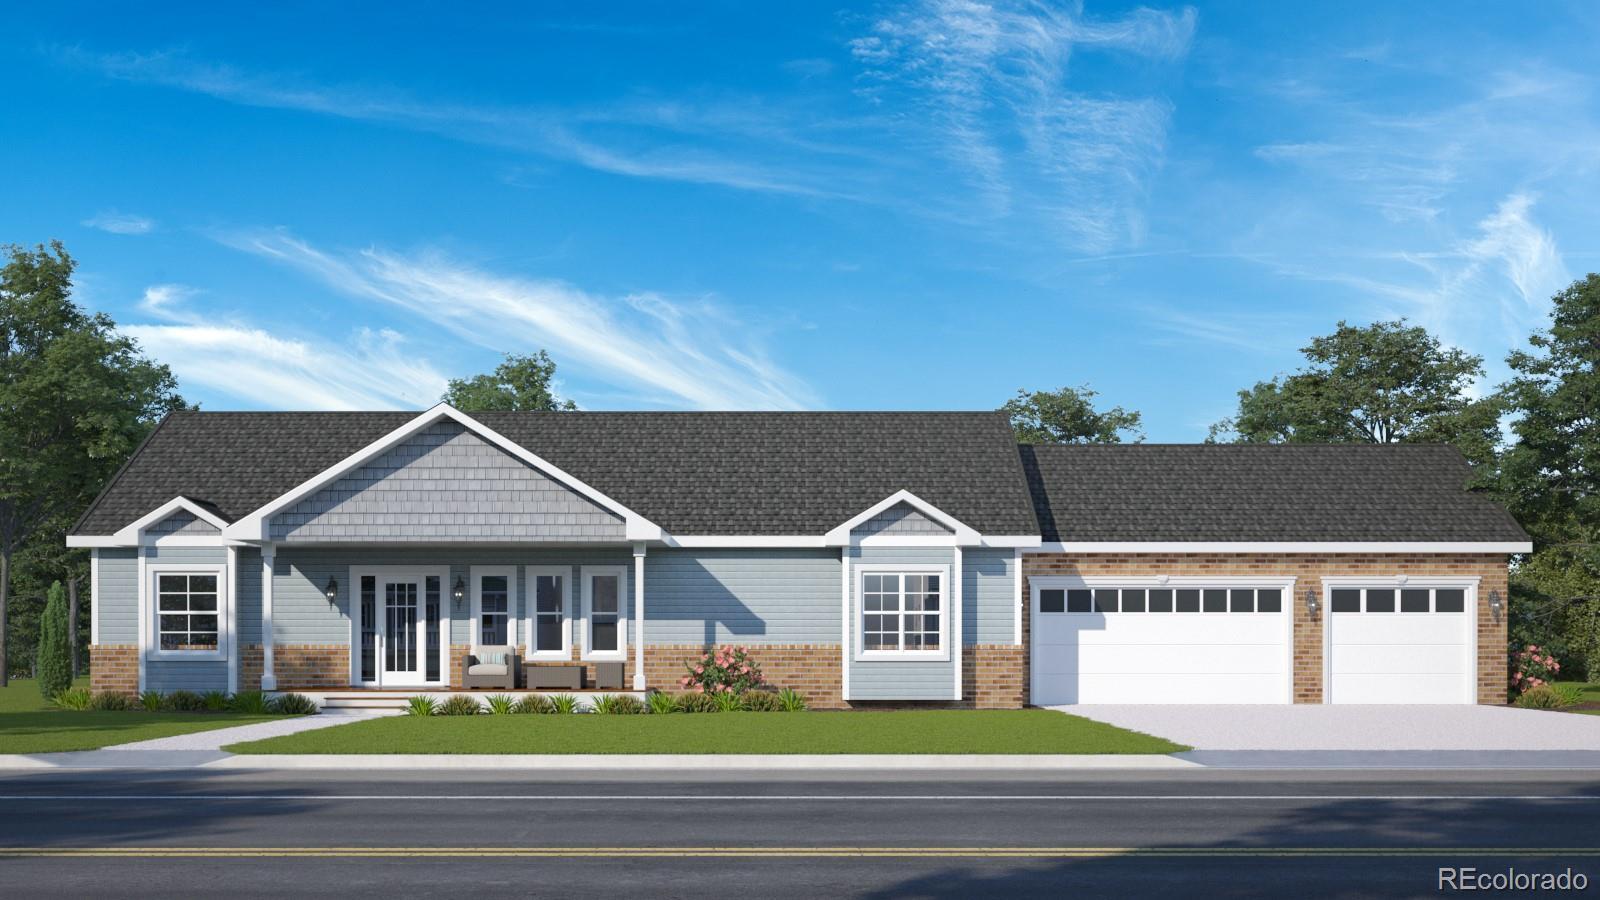 39180 E 146TH Court, Keenesburg, CO 80643 - Keenesburg, CO real estate listing